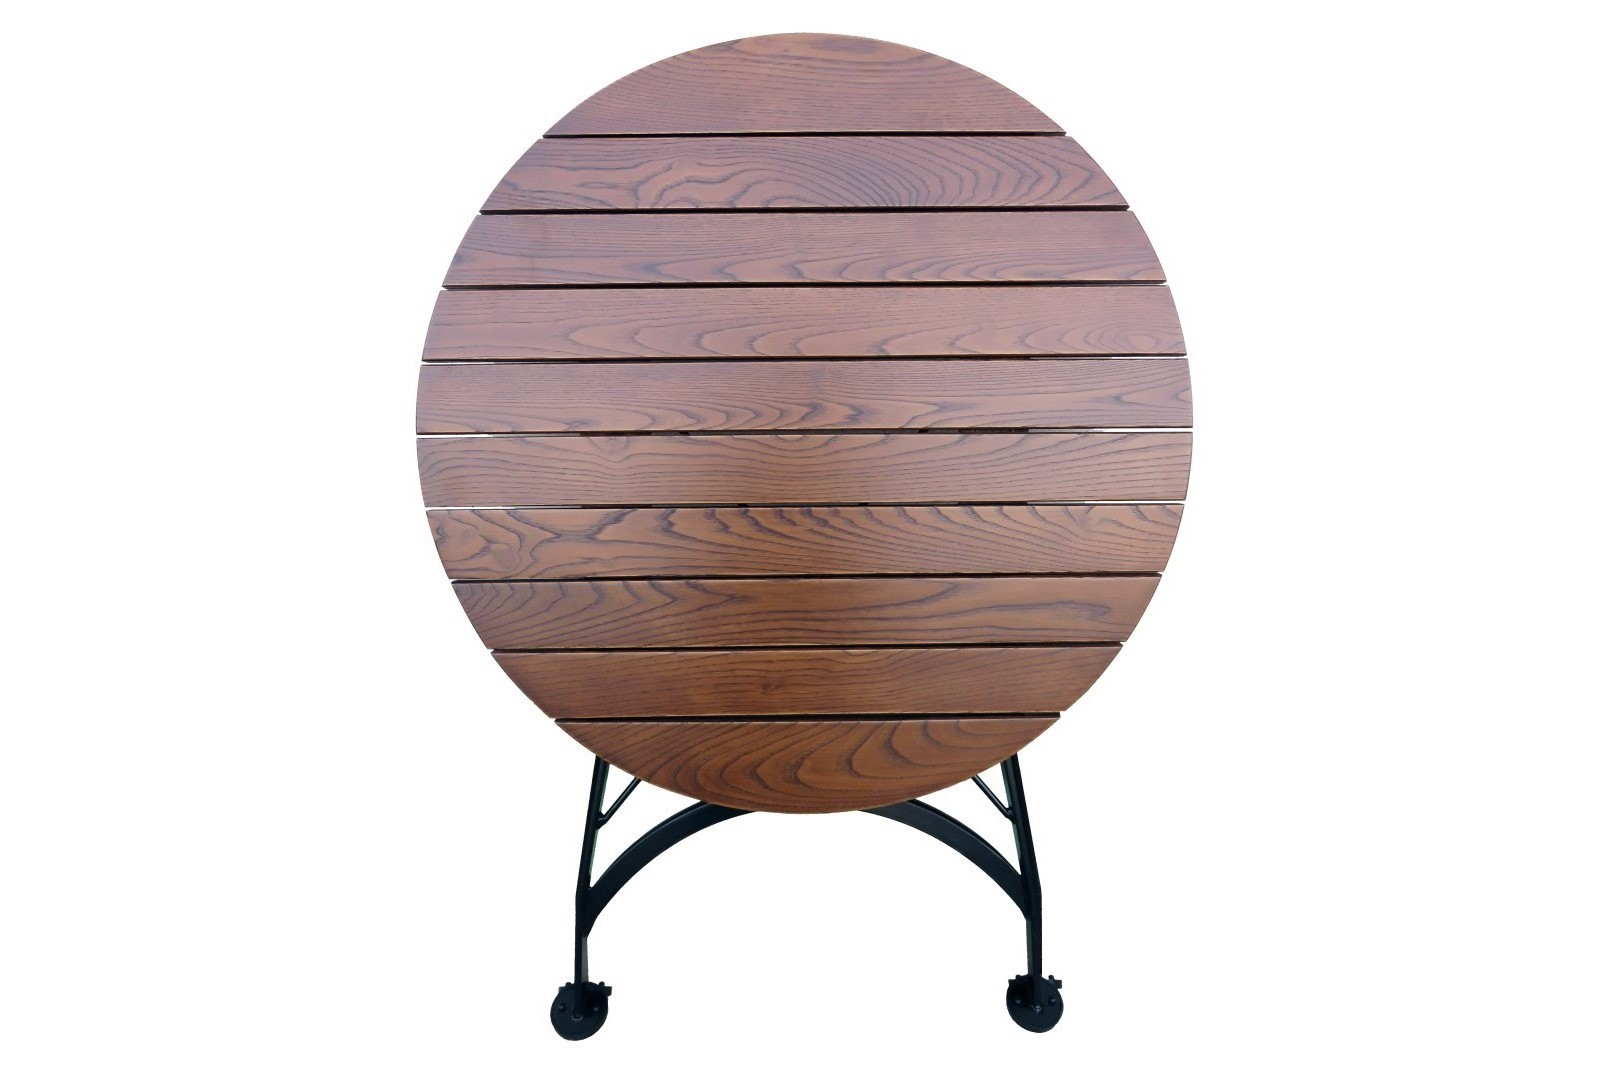 4106CW-BK European Chestnut dining table folded